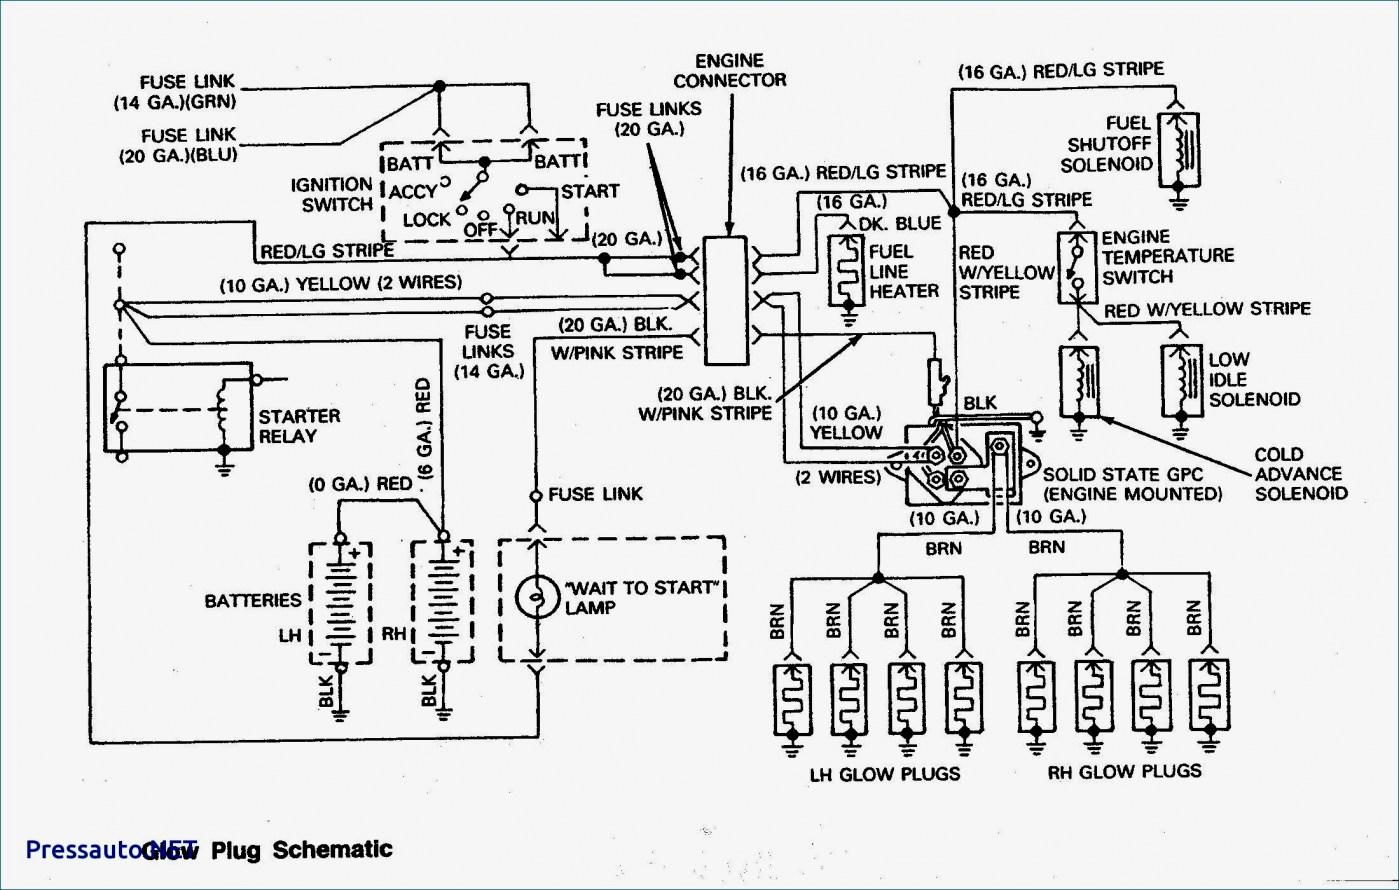 Awe Inspiring Mahindra 4110 Wiring Diagram Wiring Diagram Database Wiring Cloud Uslyletkolfr09Org